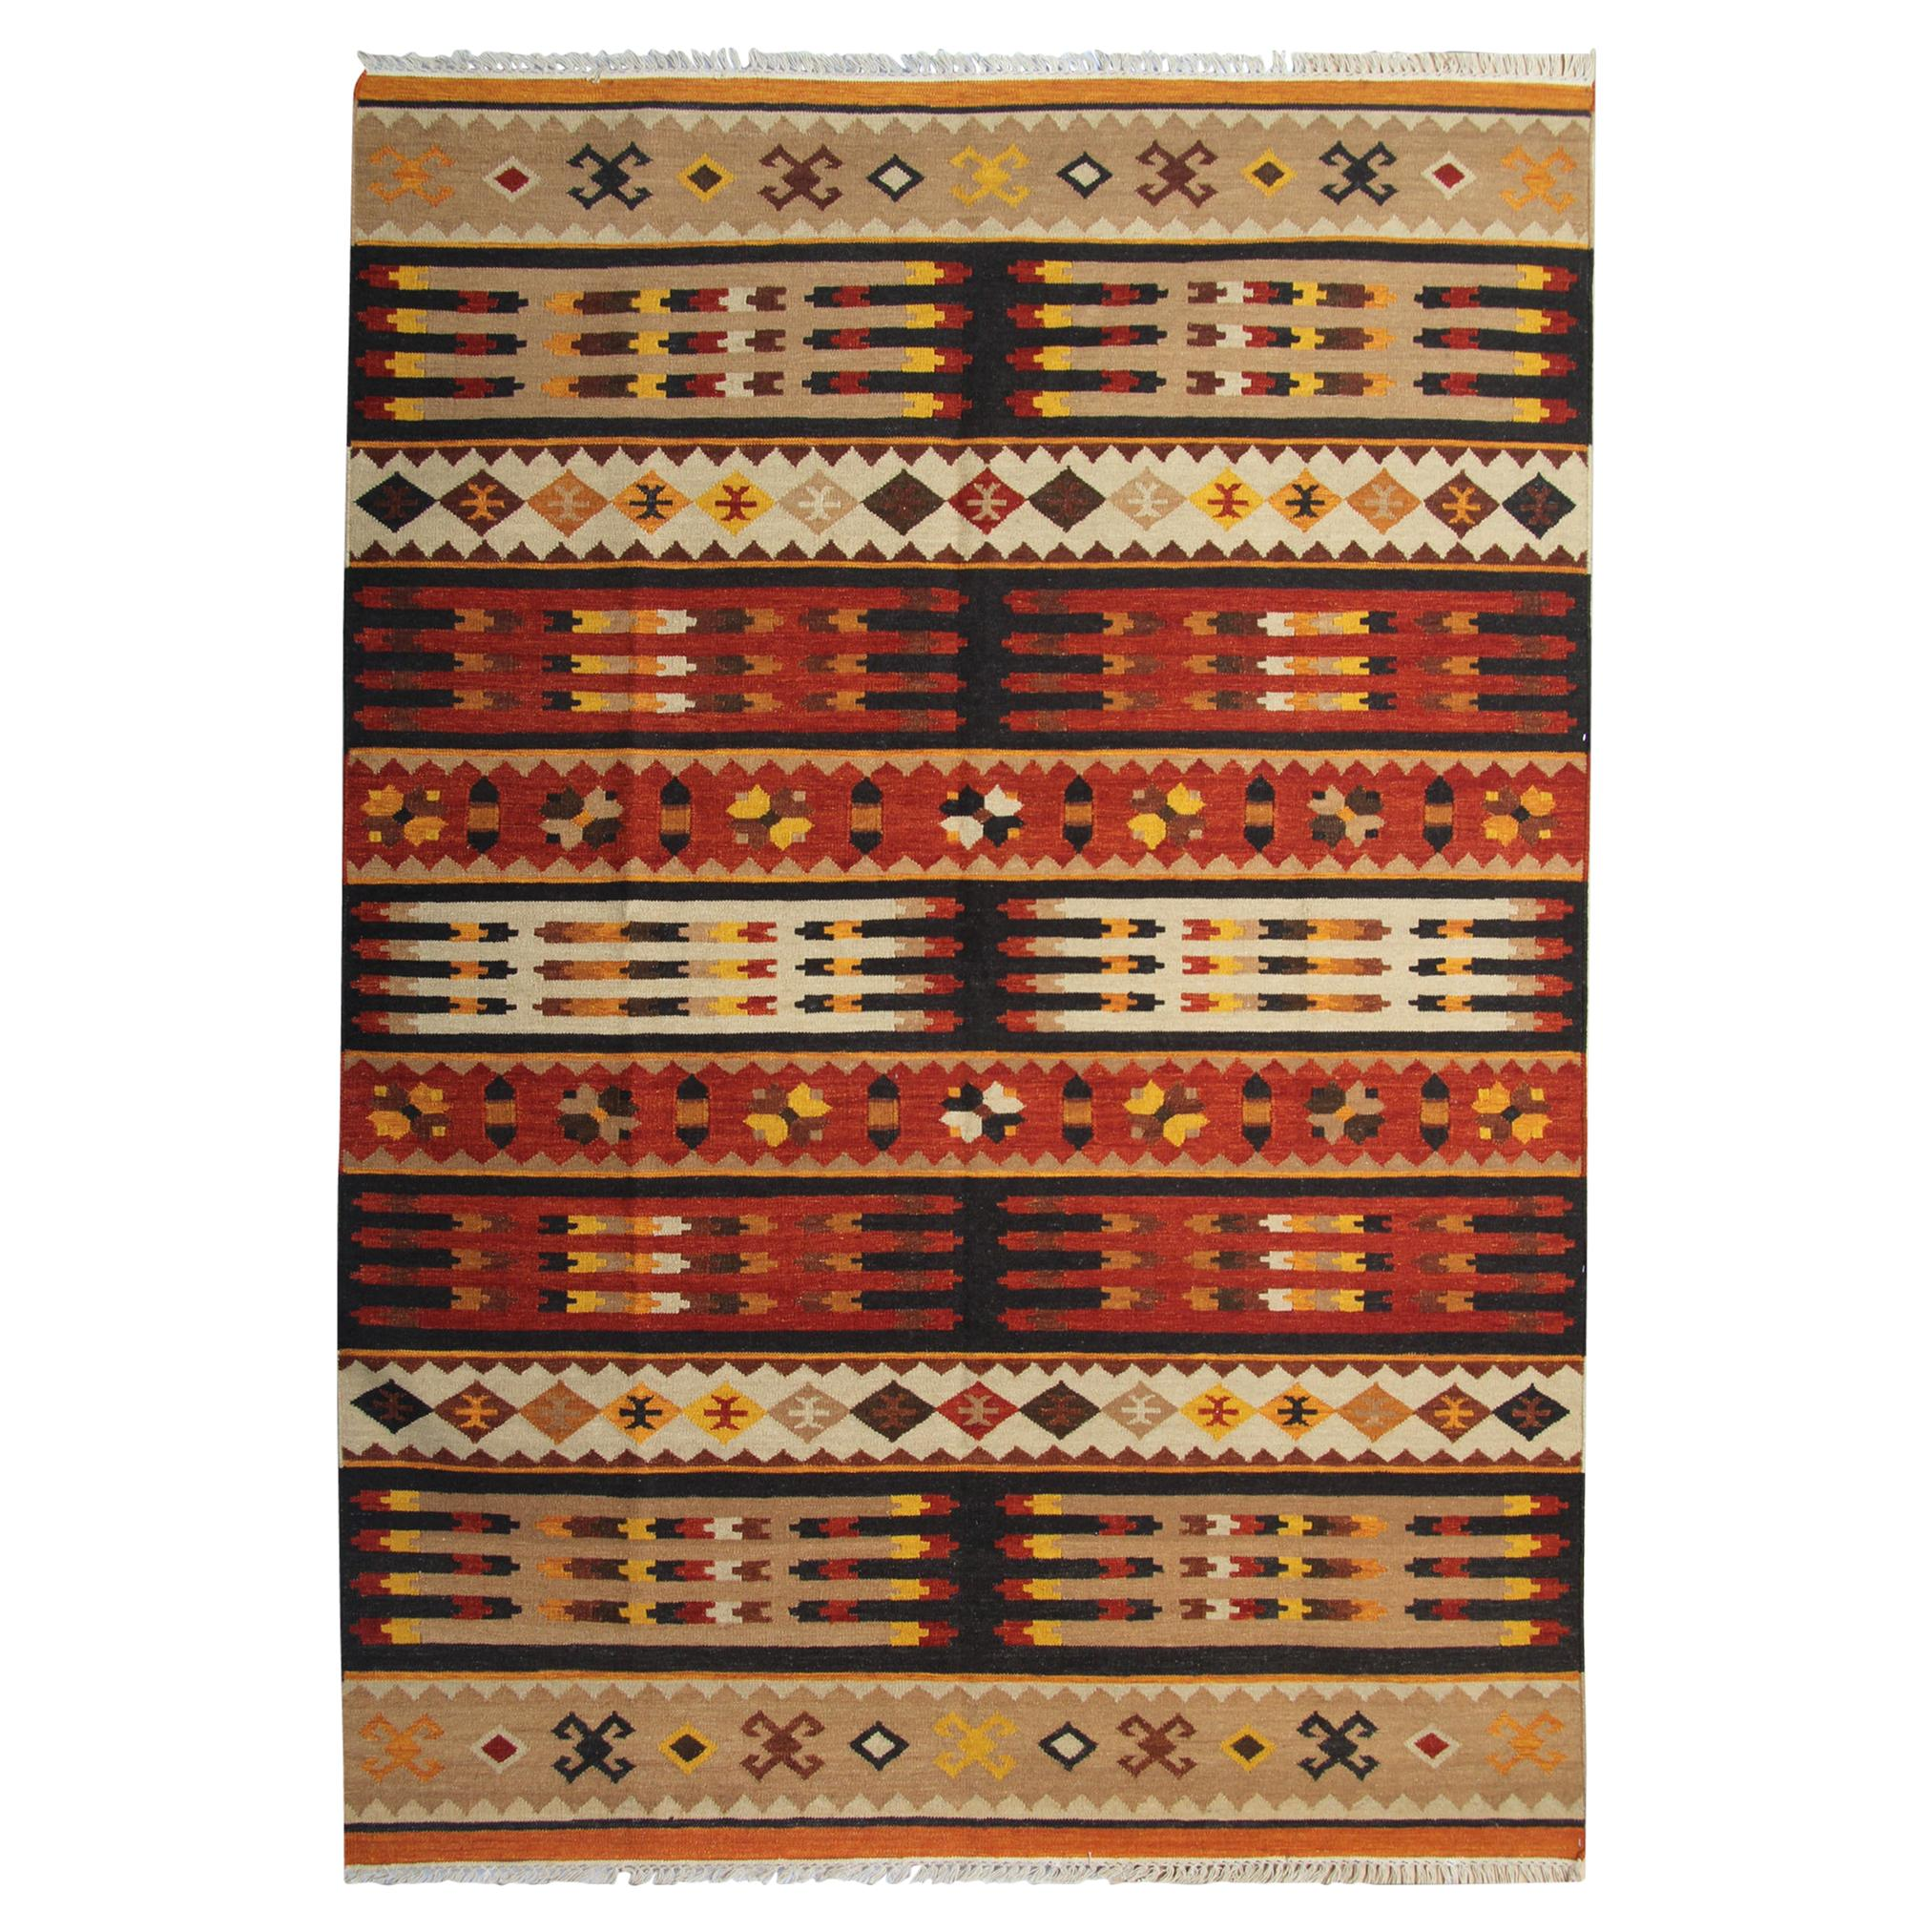 Traditional Striped Kilim Geometric Brown Rust Wool Kilim Rug